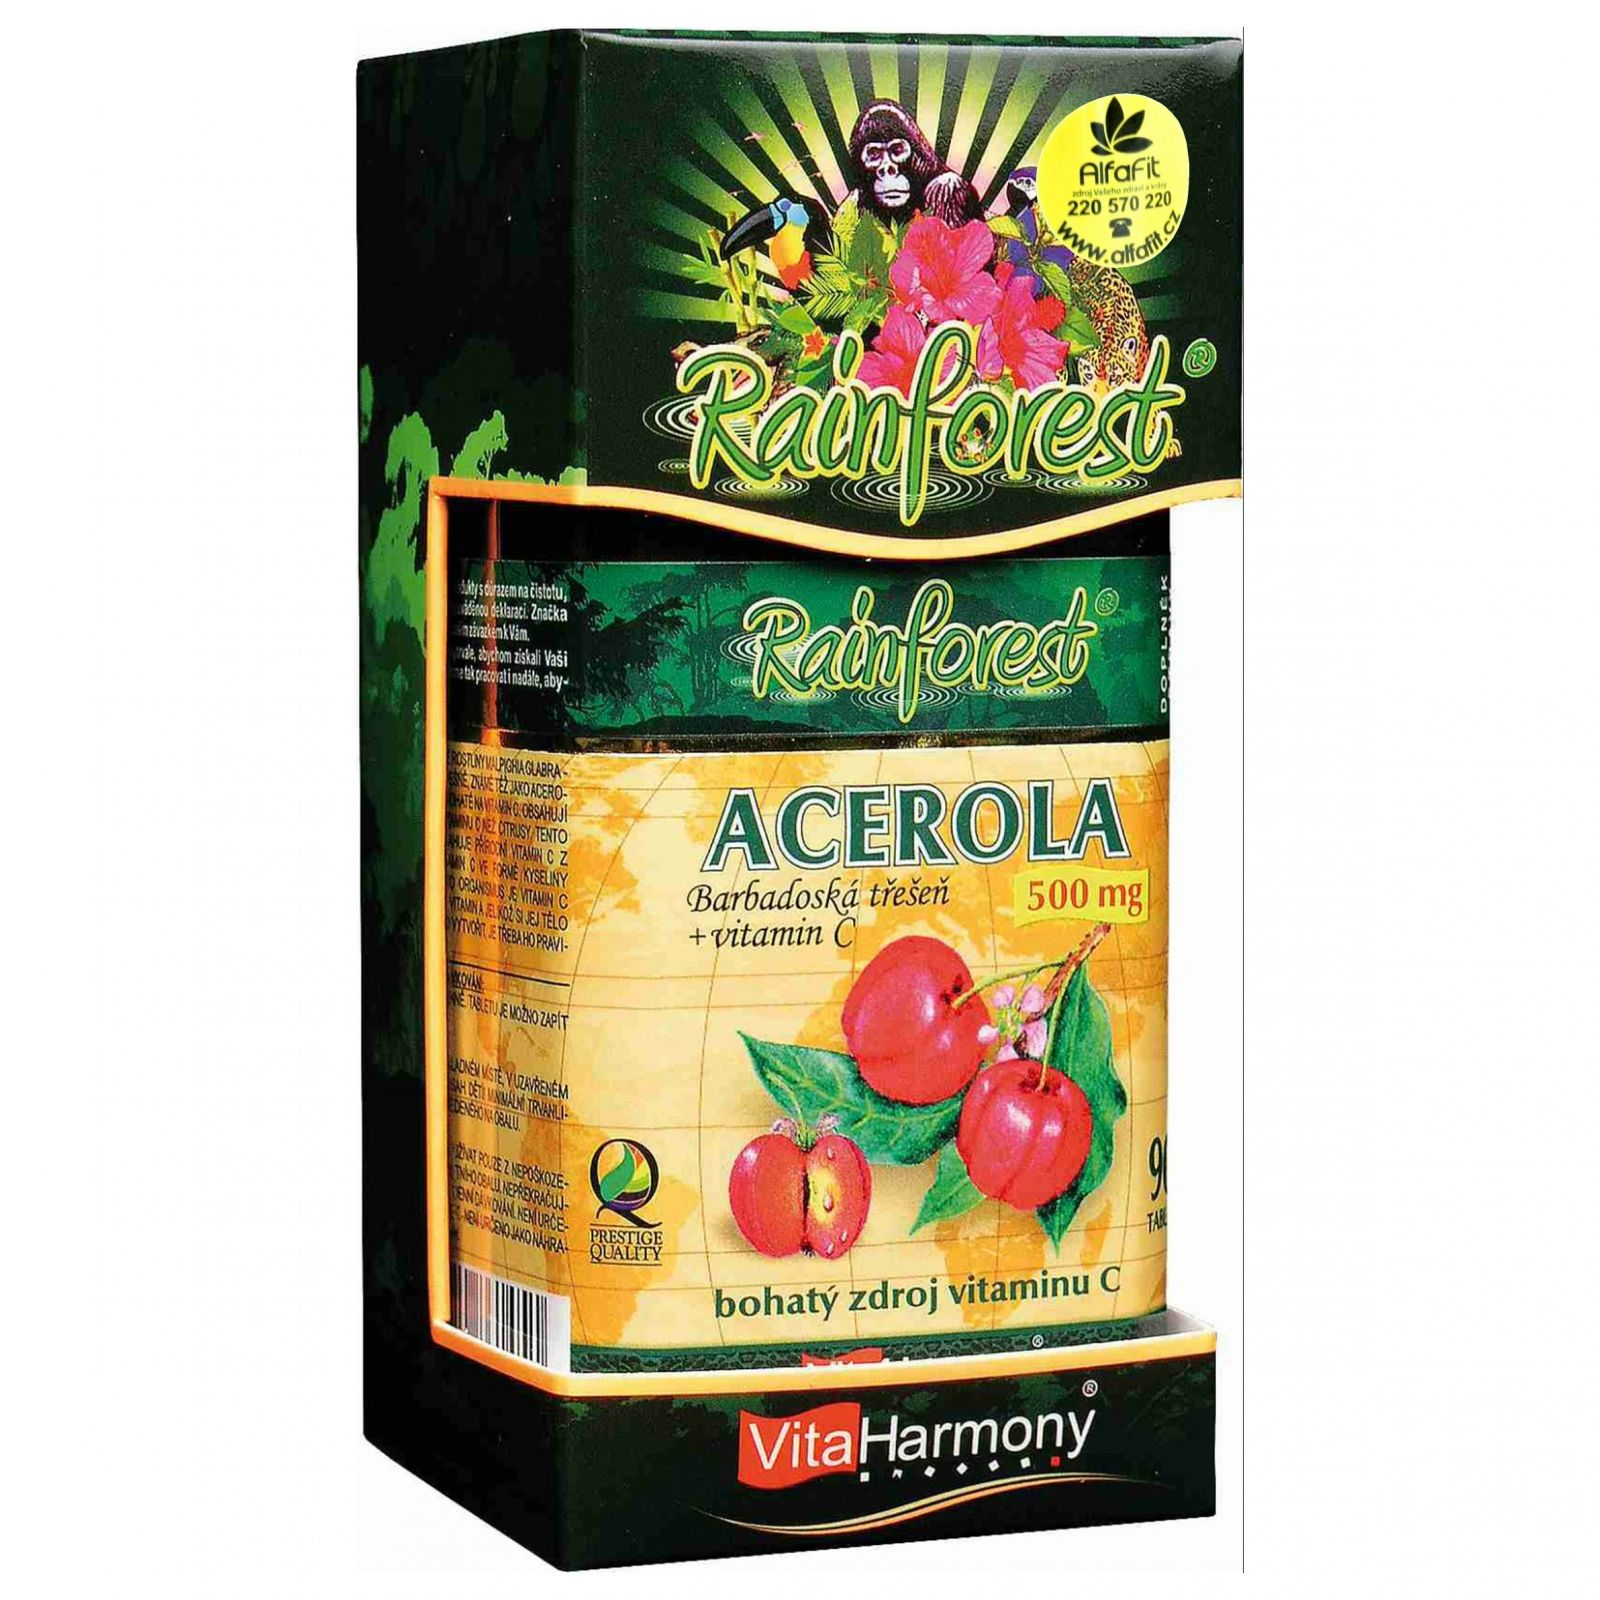 VitaHarmony Acerola 500 mg + Vitamin C 250 mg - 90 tablet